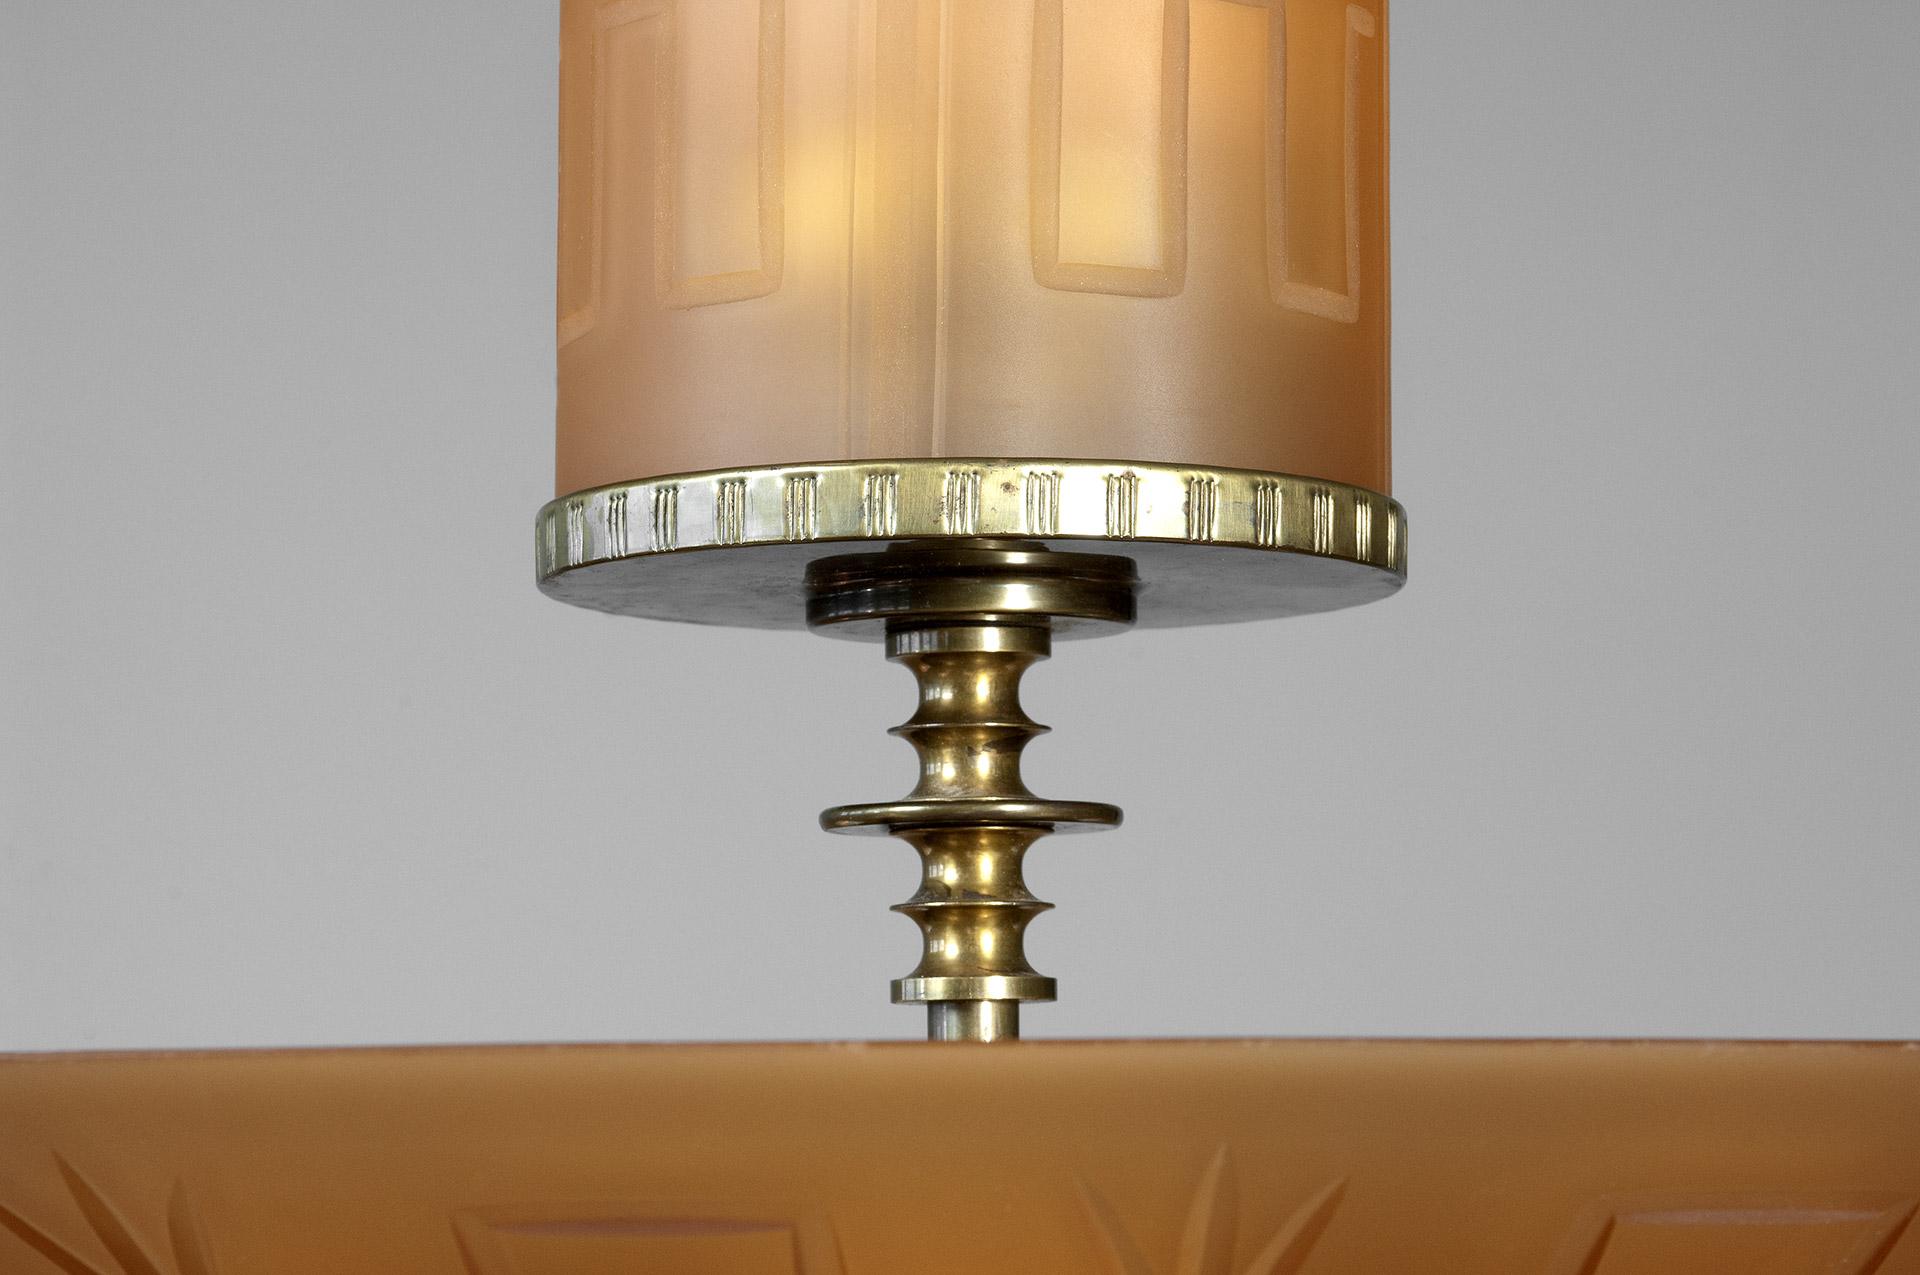 Salt Lamps Etc Lancaster Ny : Jacksons - Lamp - Simon Gate